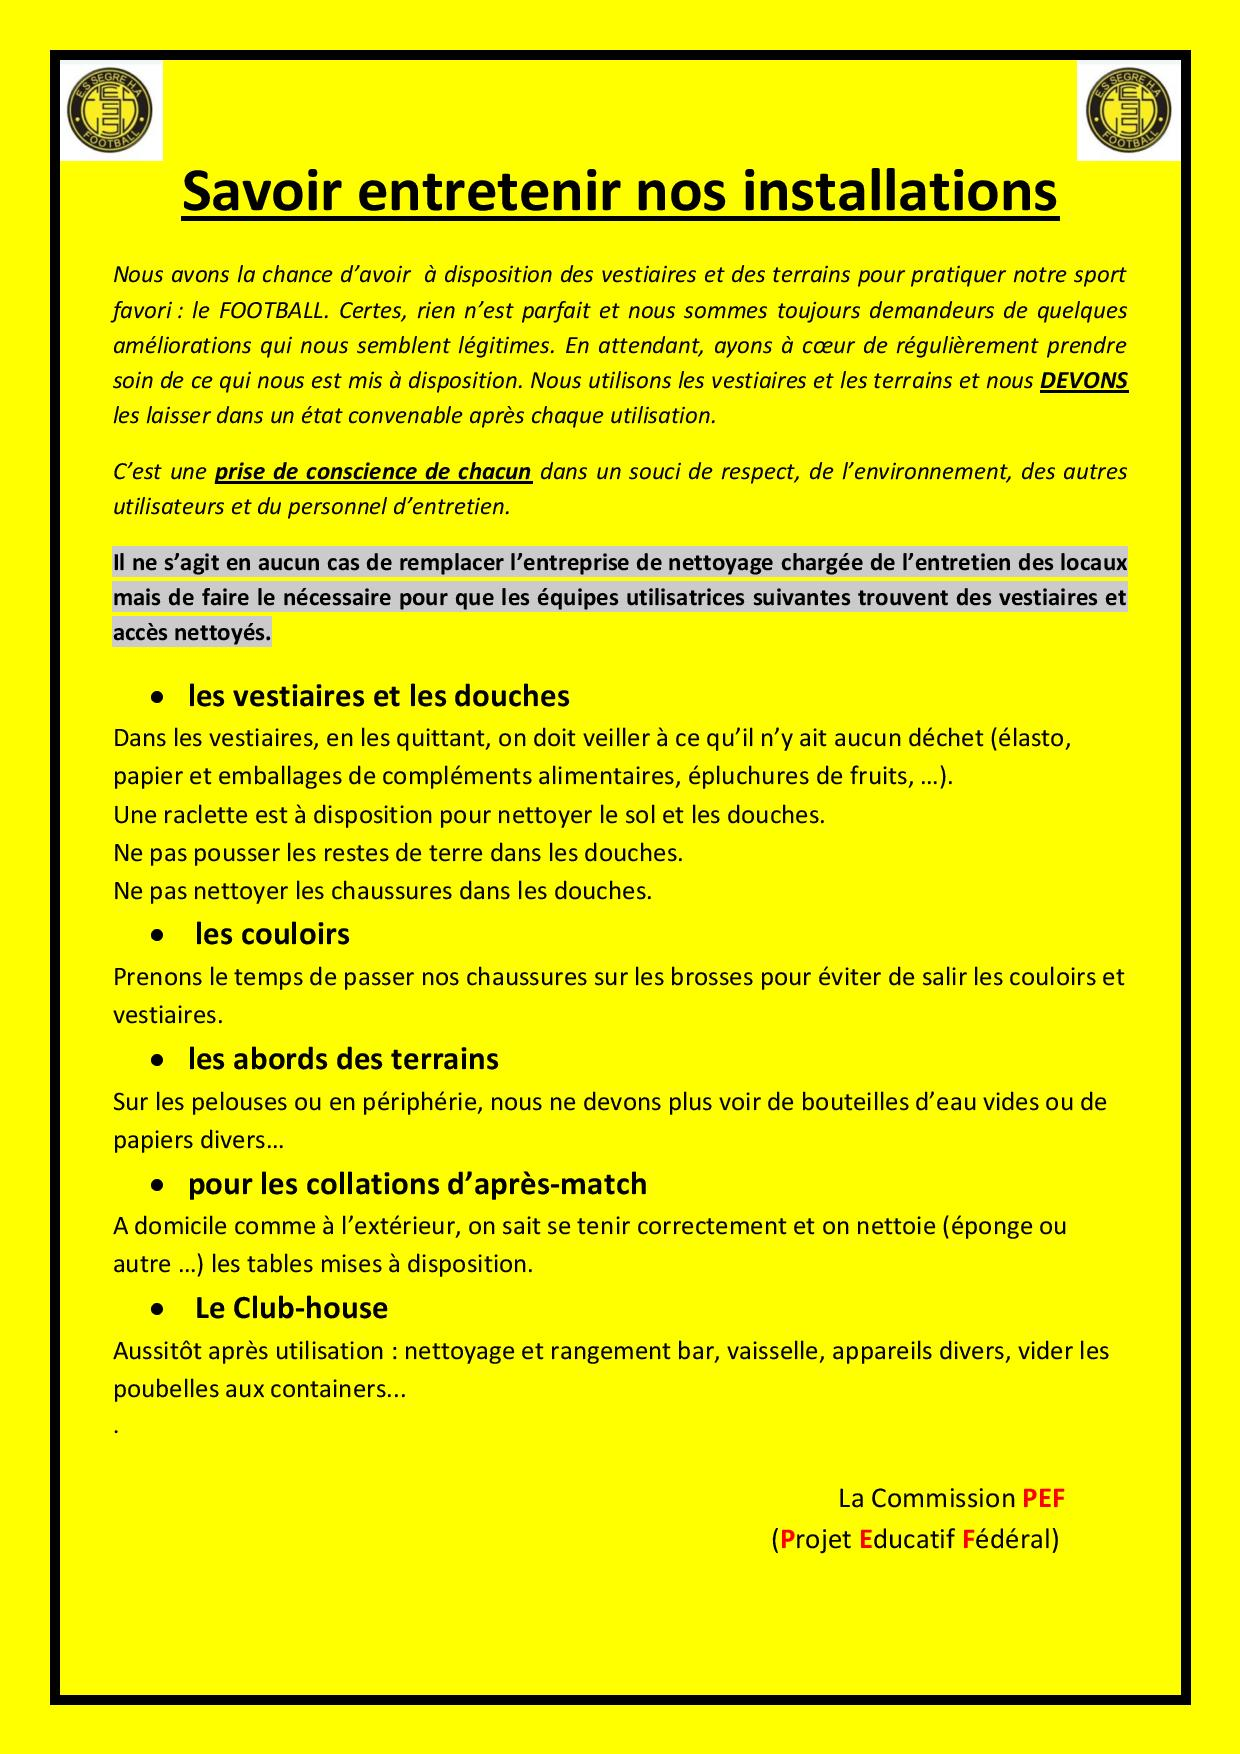 VESTIAIRES_entretien__ok0nri-page-001.jpg